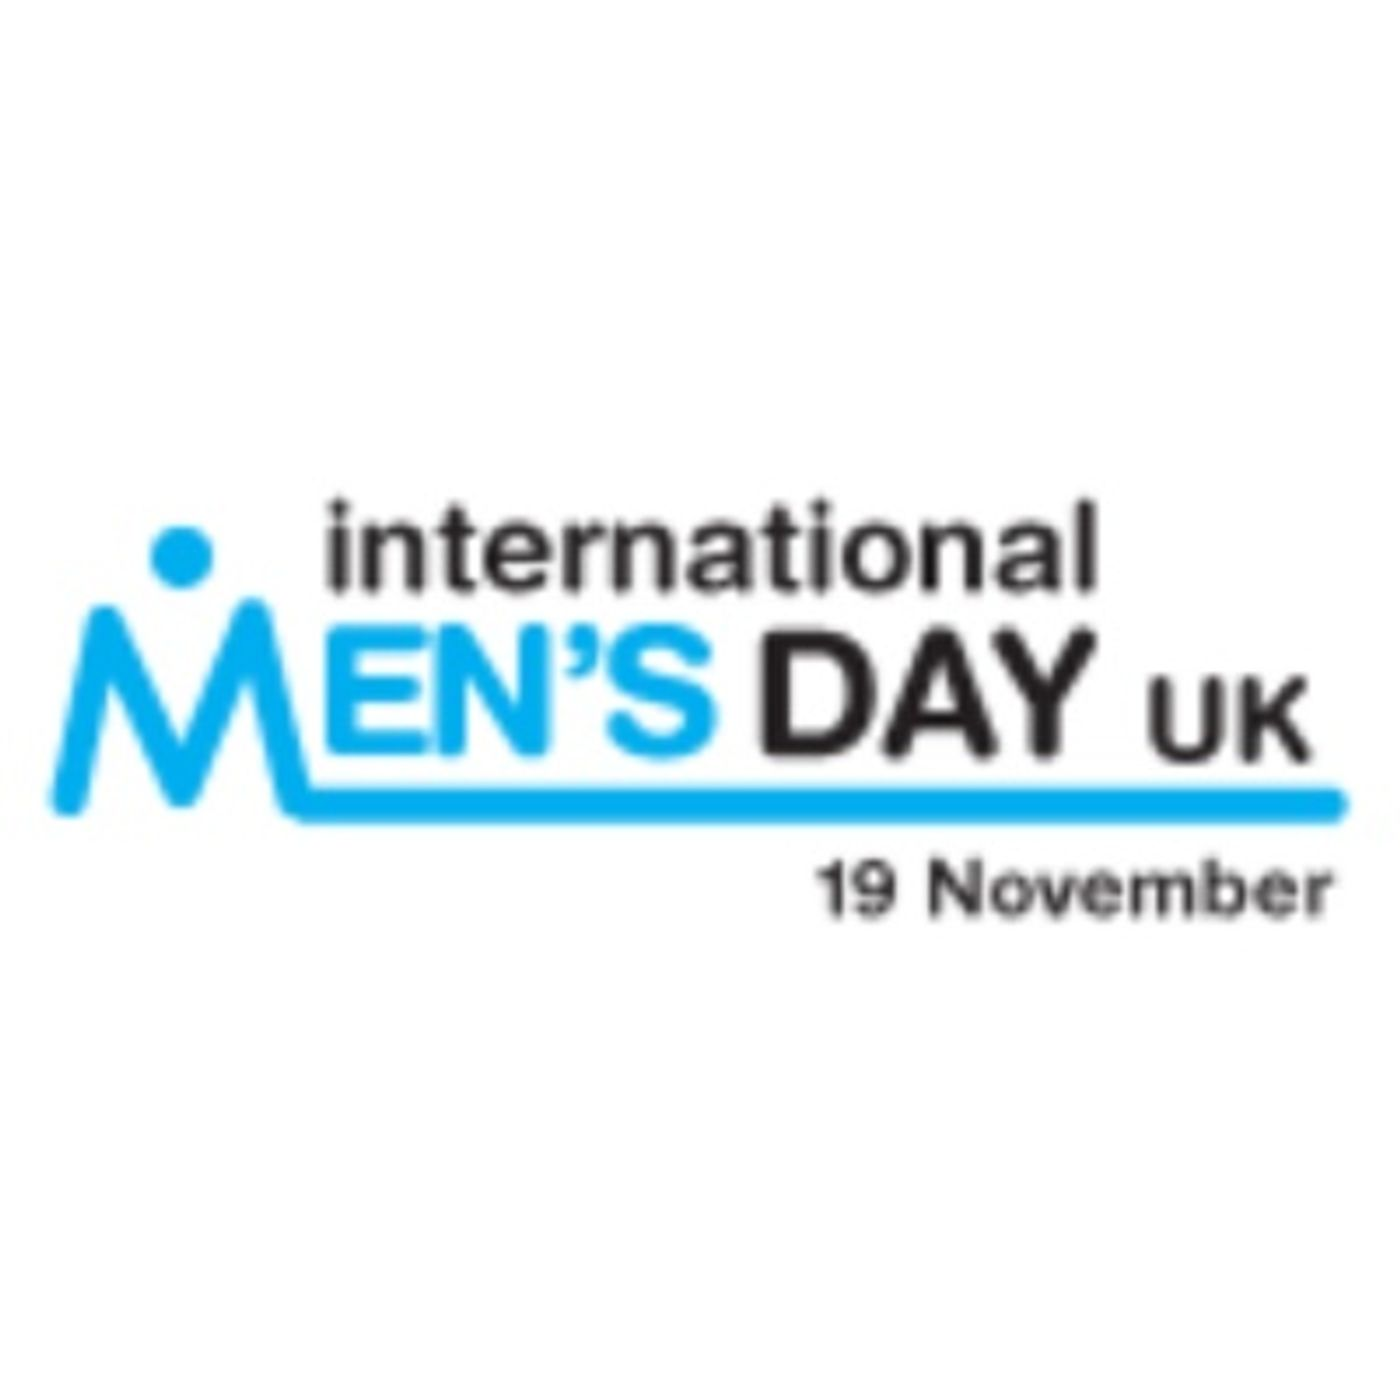 International men's day special